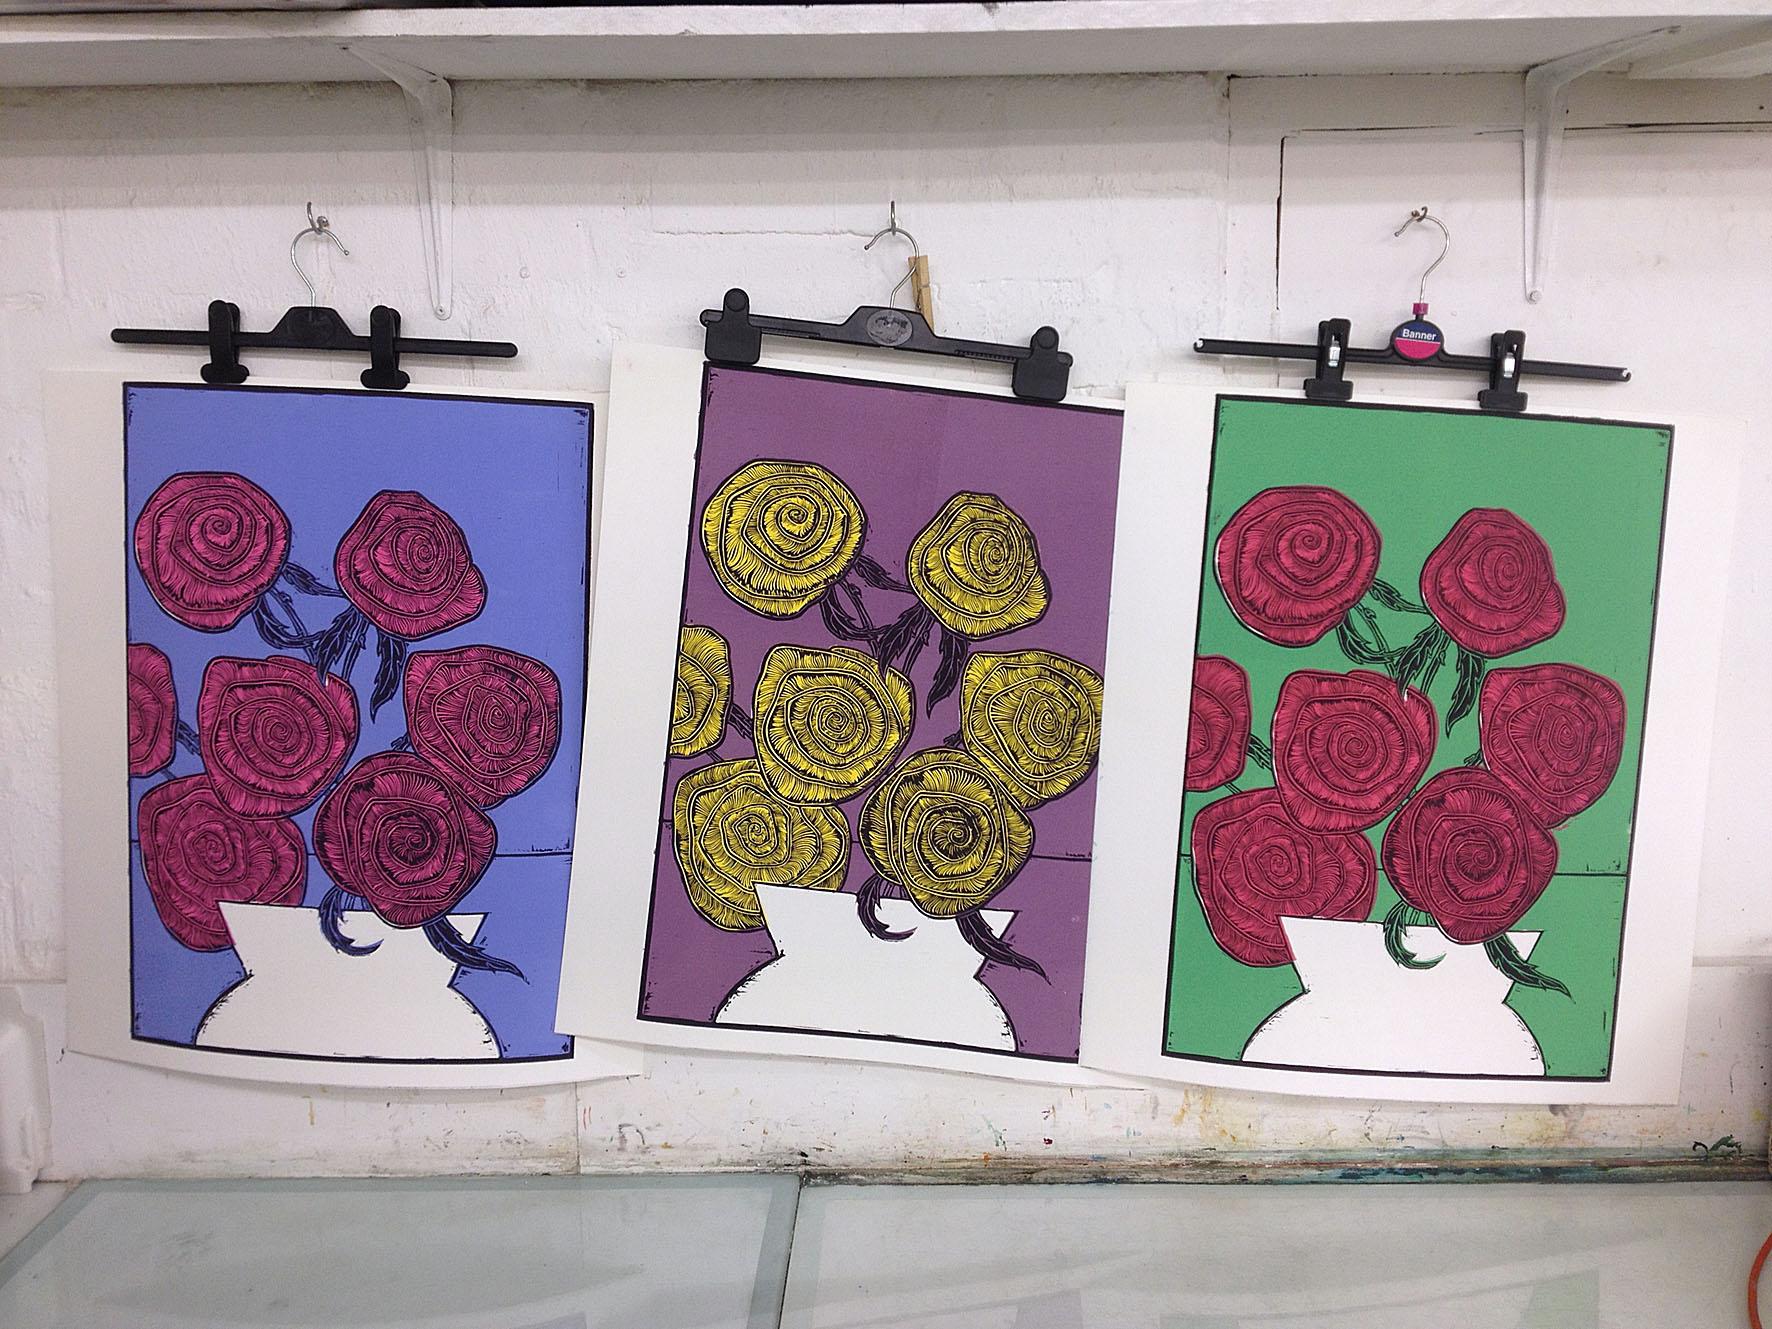 the three colour pathways hanging around